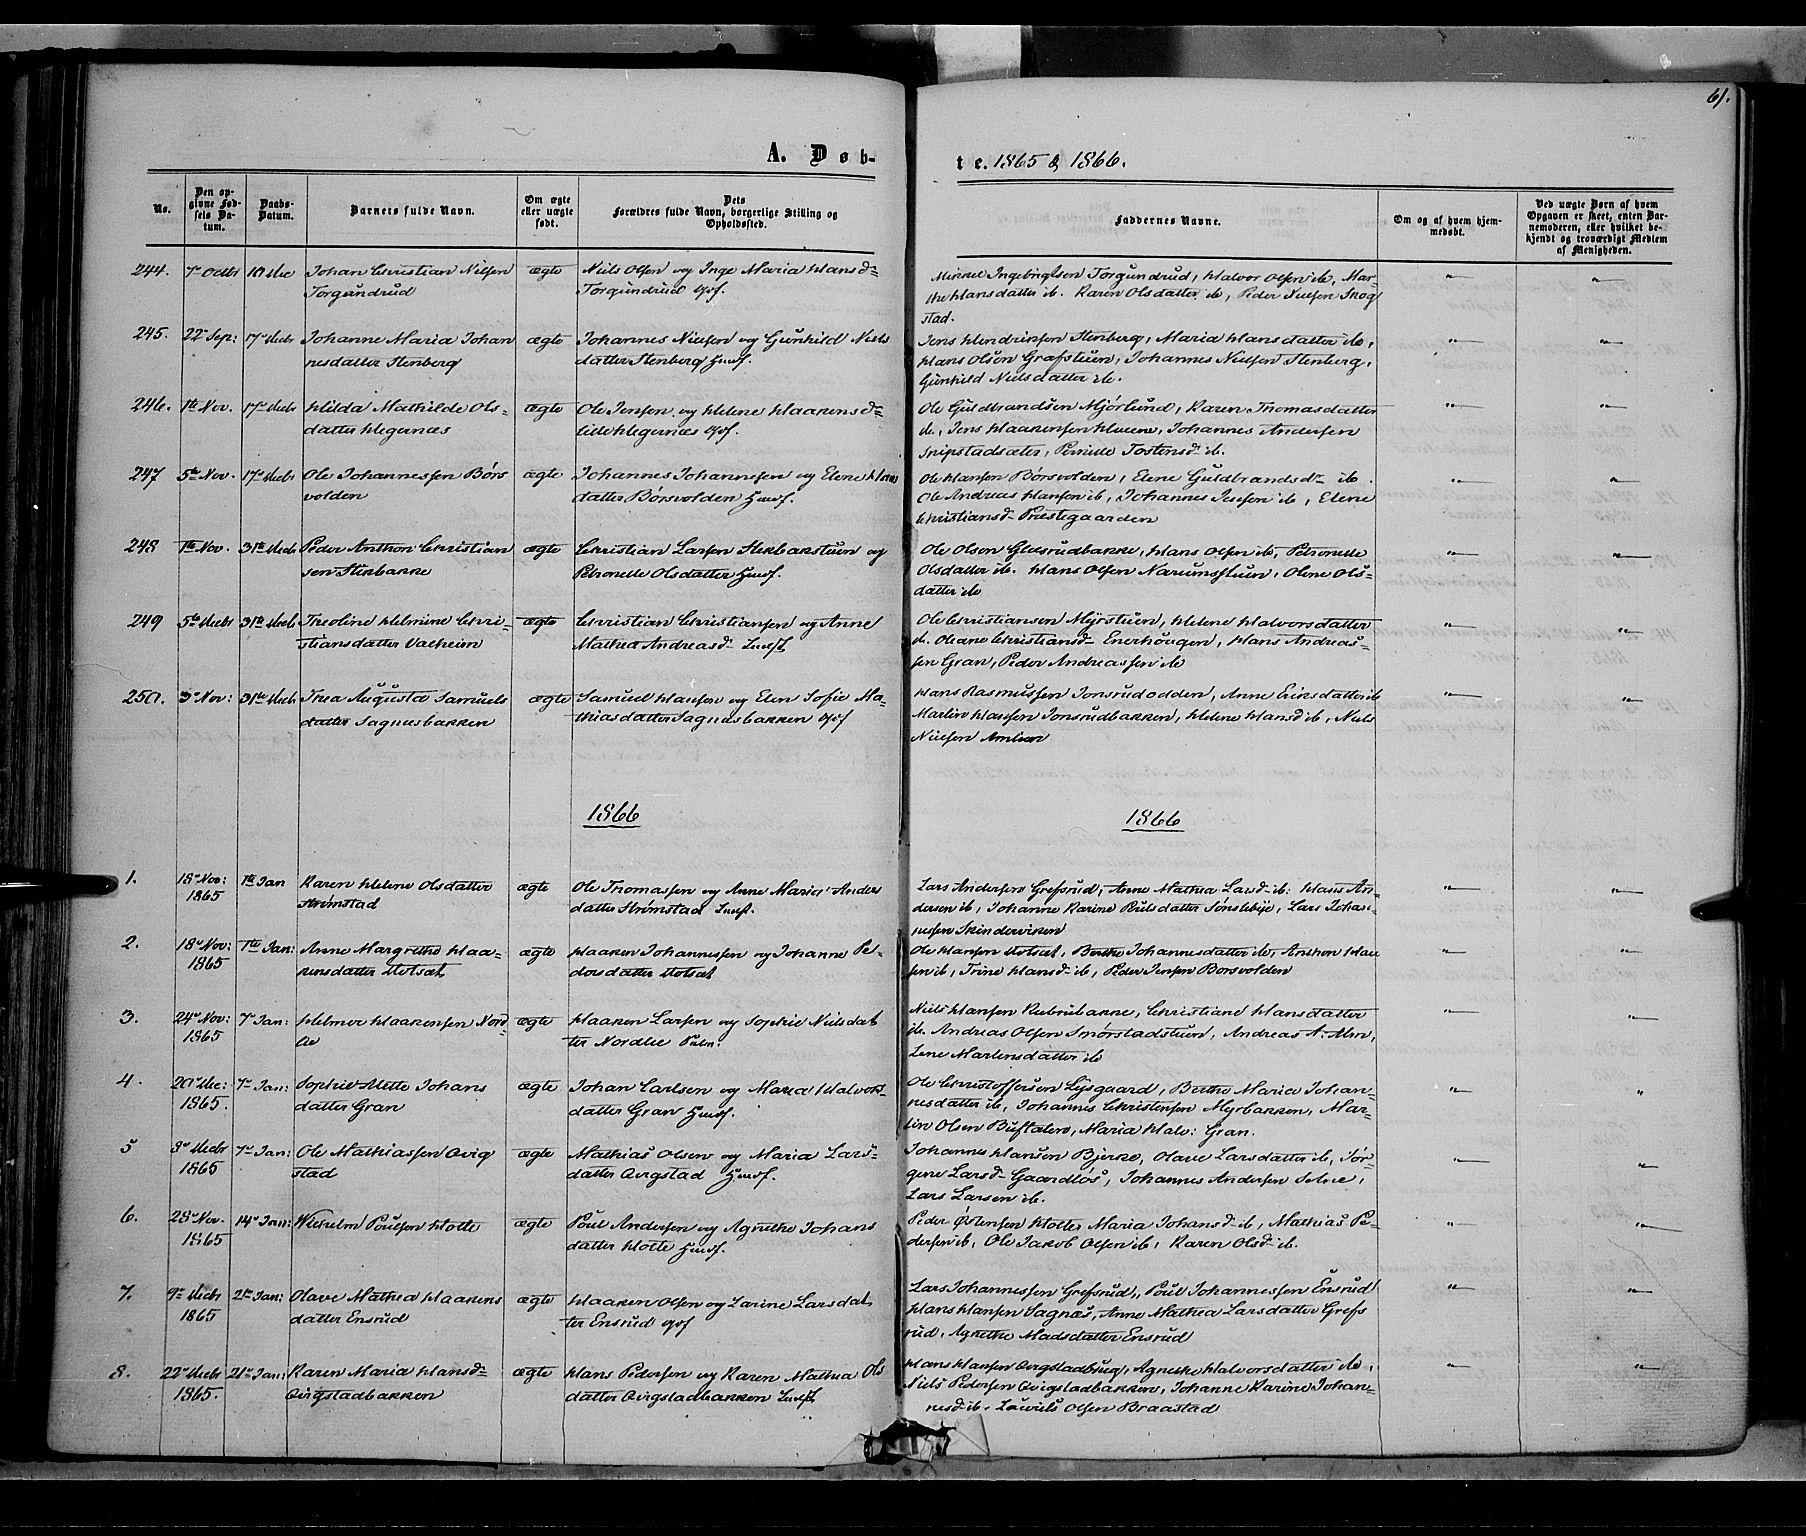 SAH, Vestre Toten prestekontor, H/Ha/Haa/L0007: Ministerialbok nr. 7, 1862-1869, s. 61